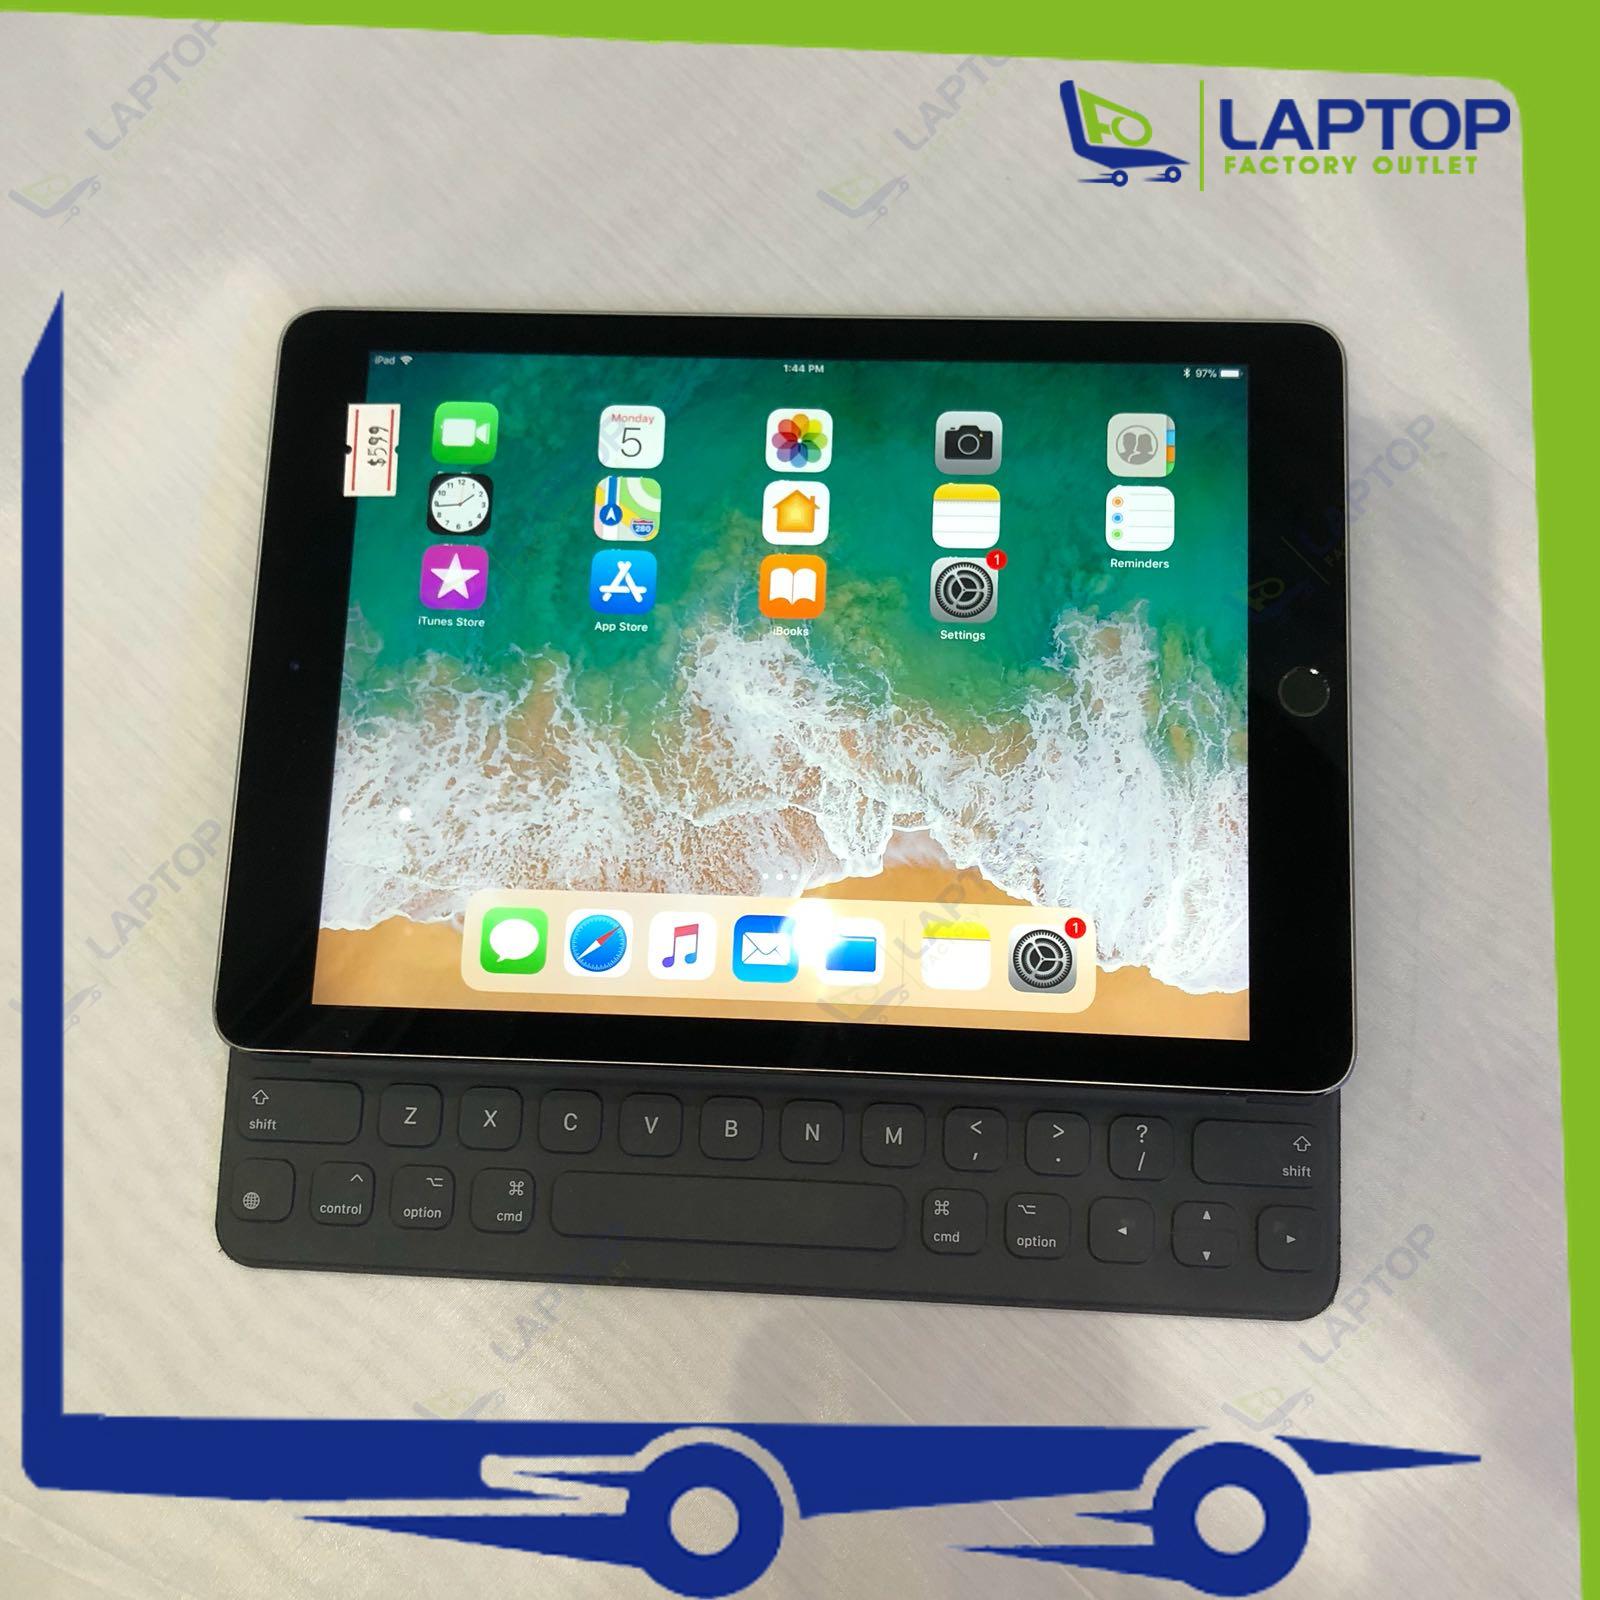 APPLE iPad Pro 9.7 (WiFi) 32GB Space Gray [Preowned]